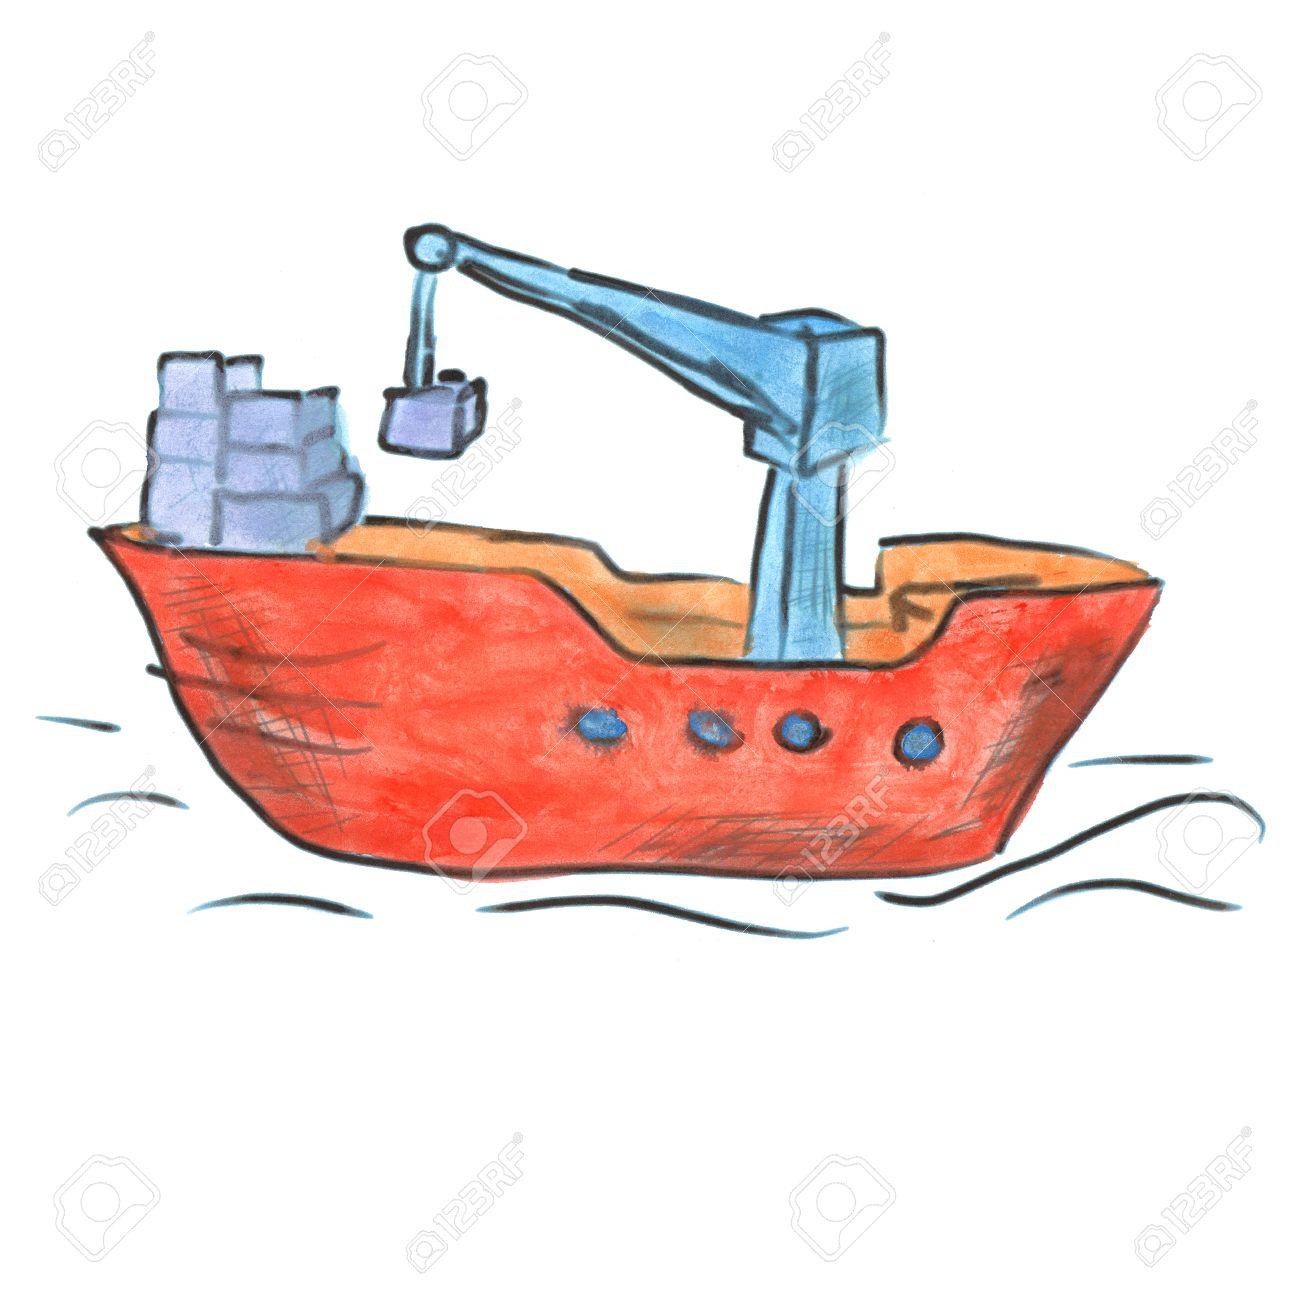 1300x1300 Red Cargo Boat Cartoon Watercolor Isolated Handmade Stock Photo